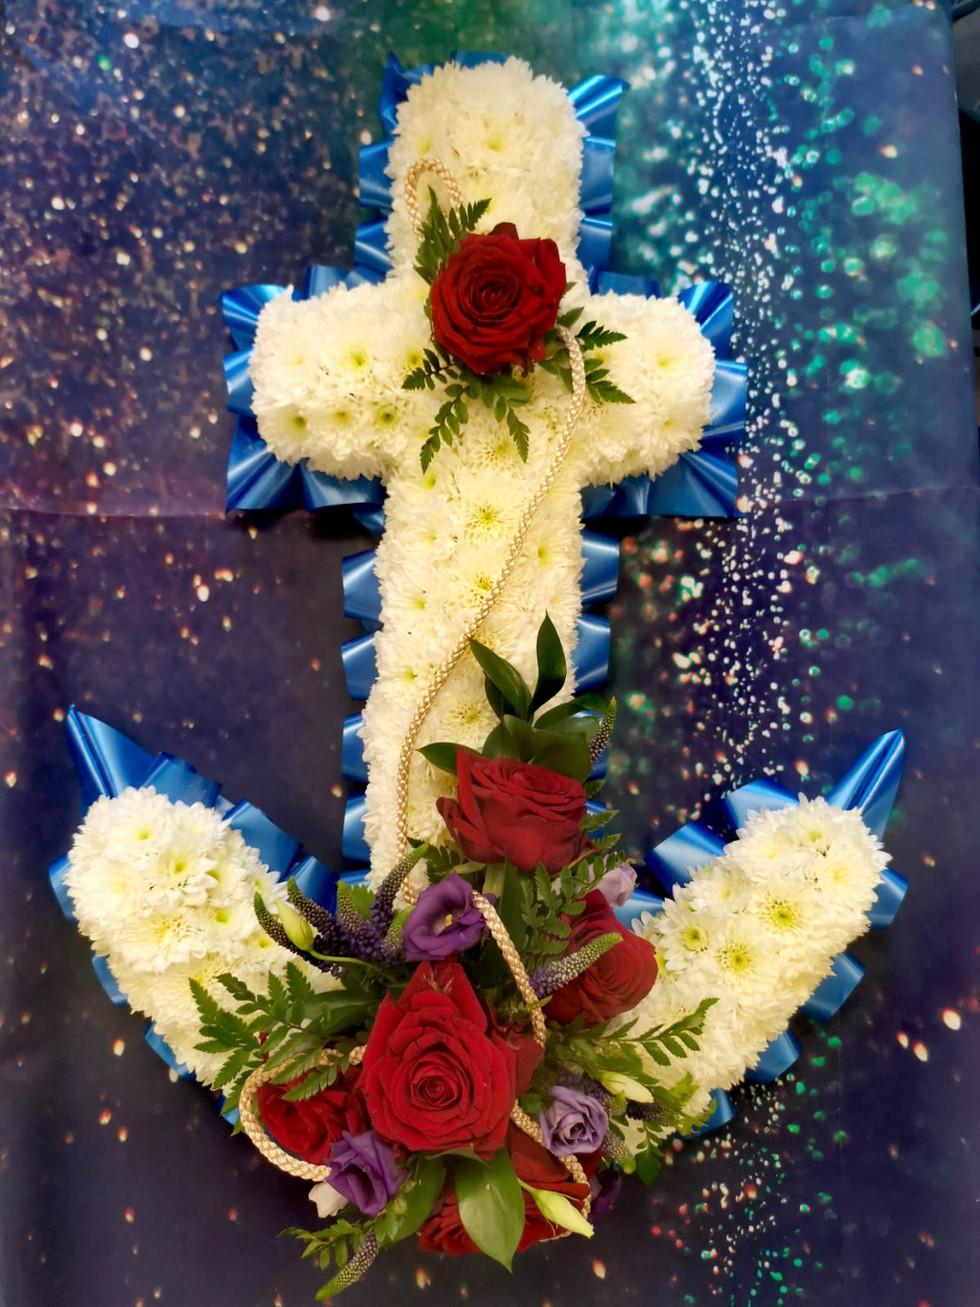 bespoke funeral tribute anchor.jpeg